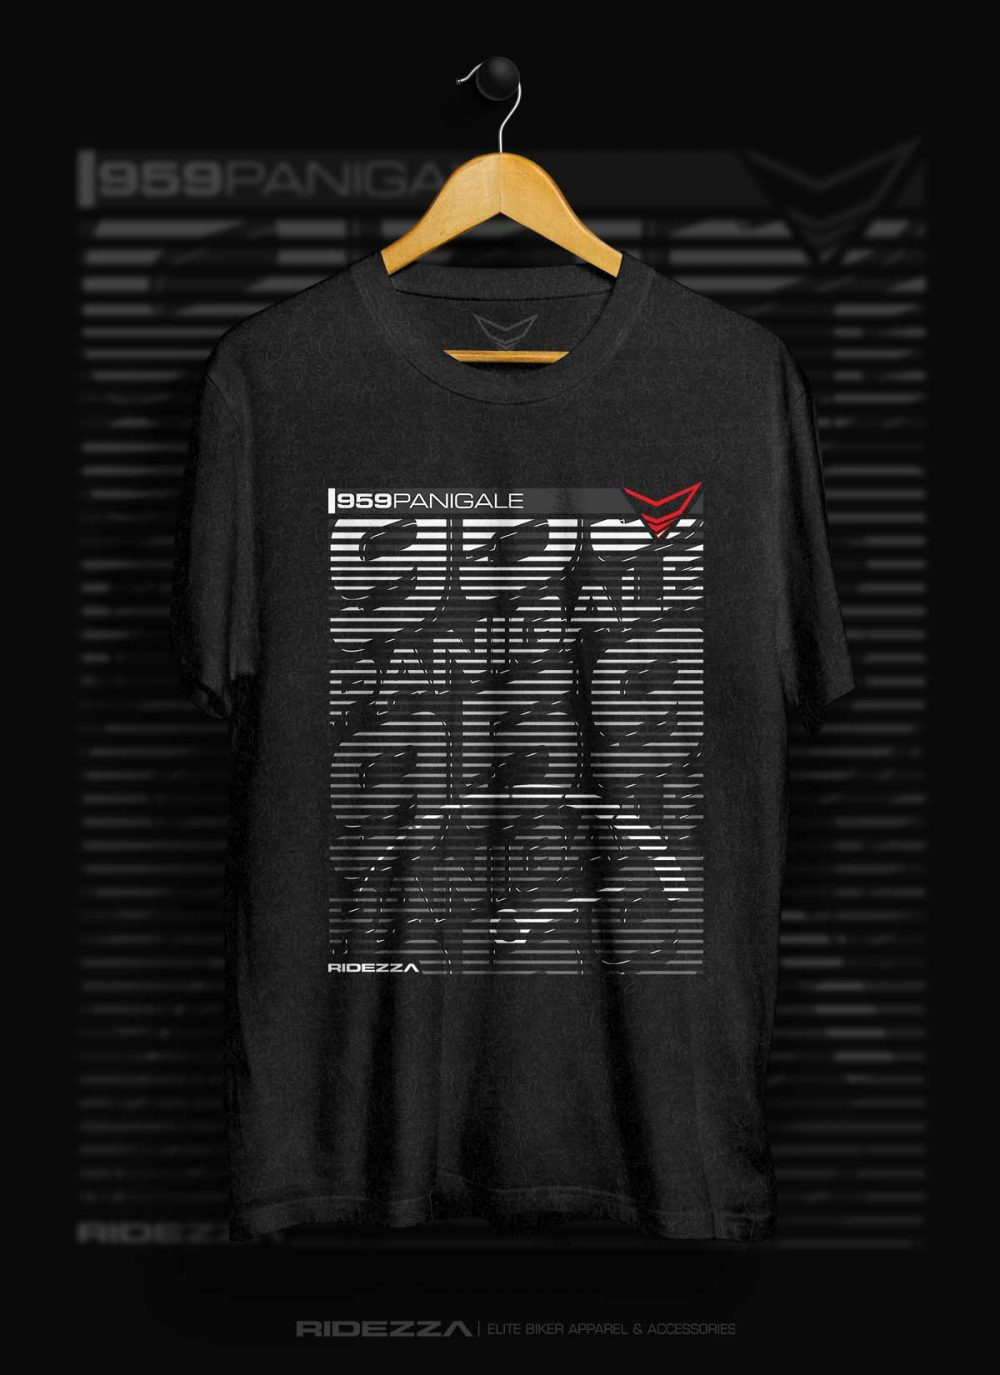 Ducati 959 Panigale Speedy T-Shirt